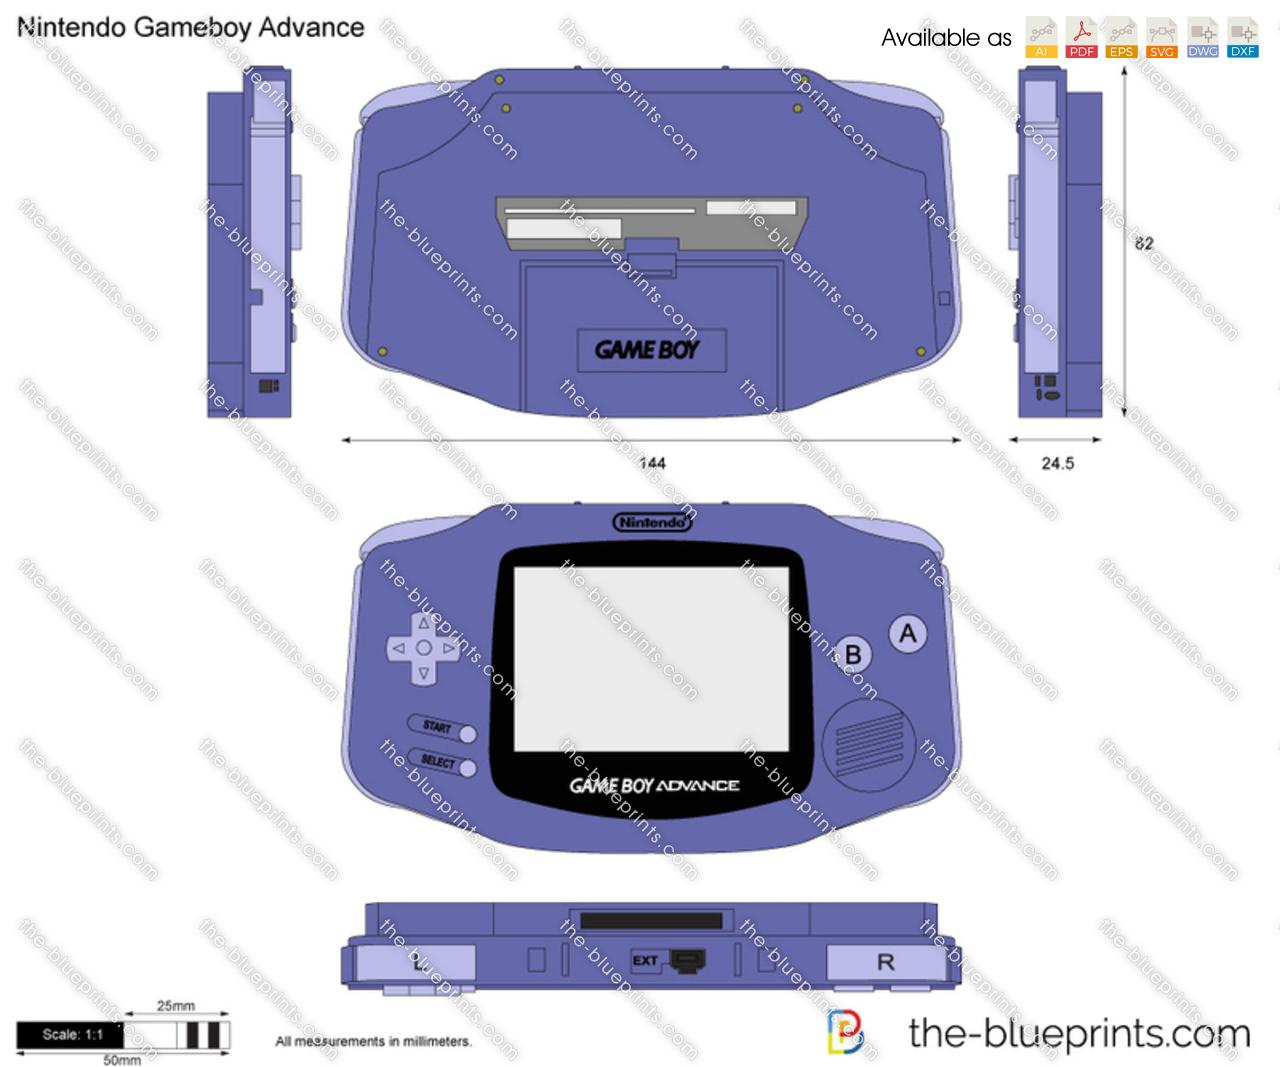 Nintendo Gameboy Advance